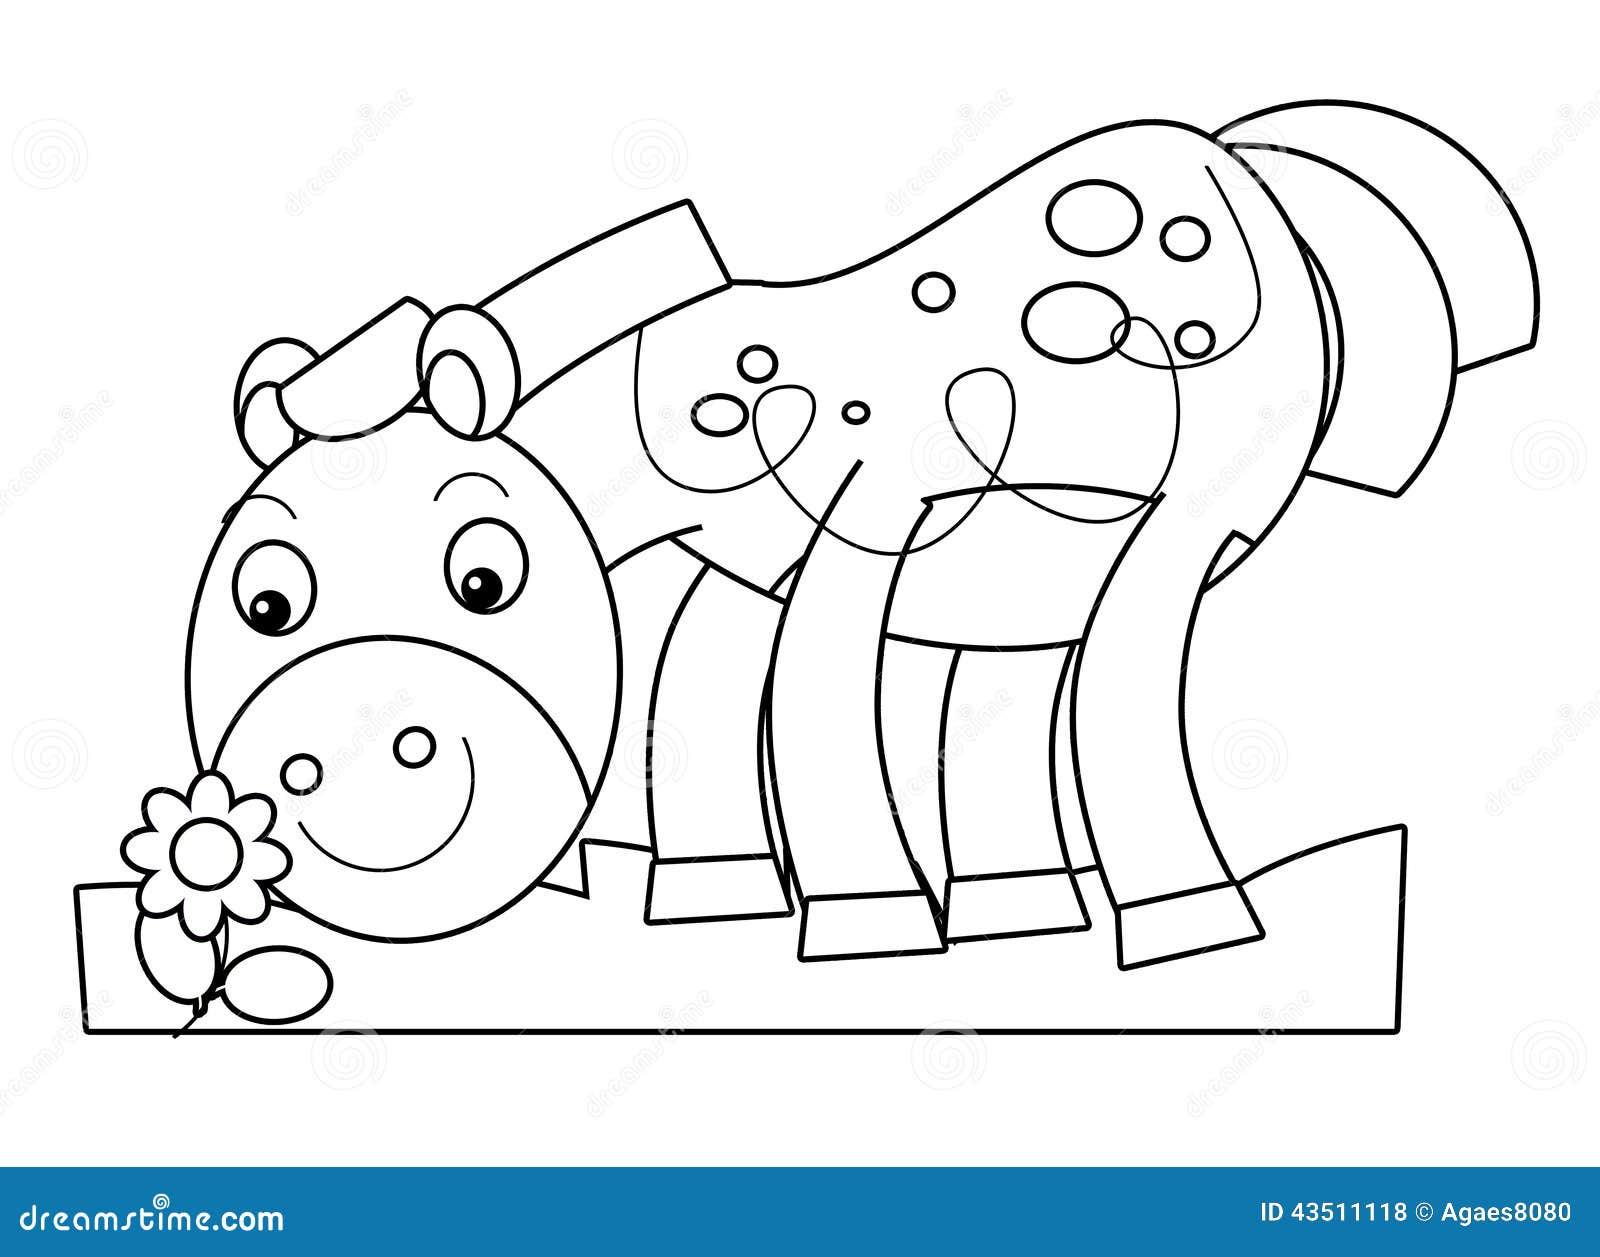 Cartoon horse stock illustration. Image of mascot, graphic ...